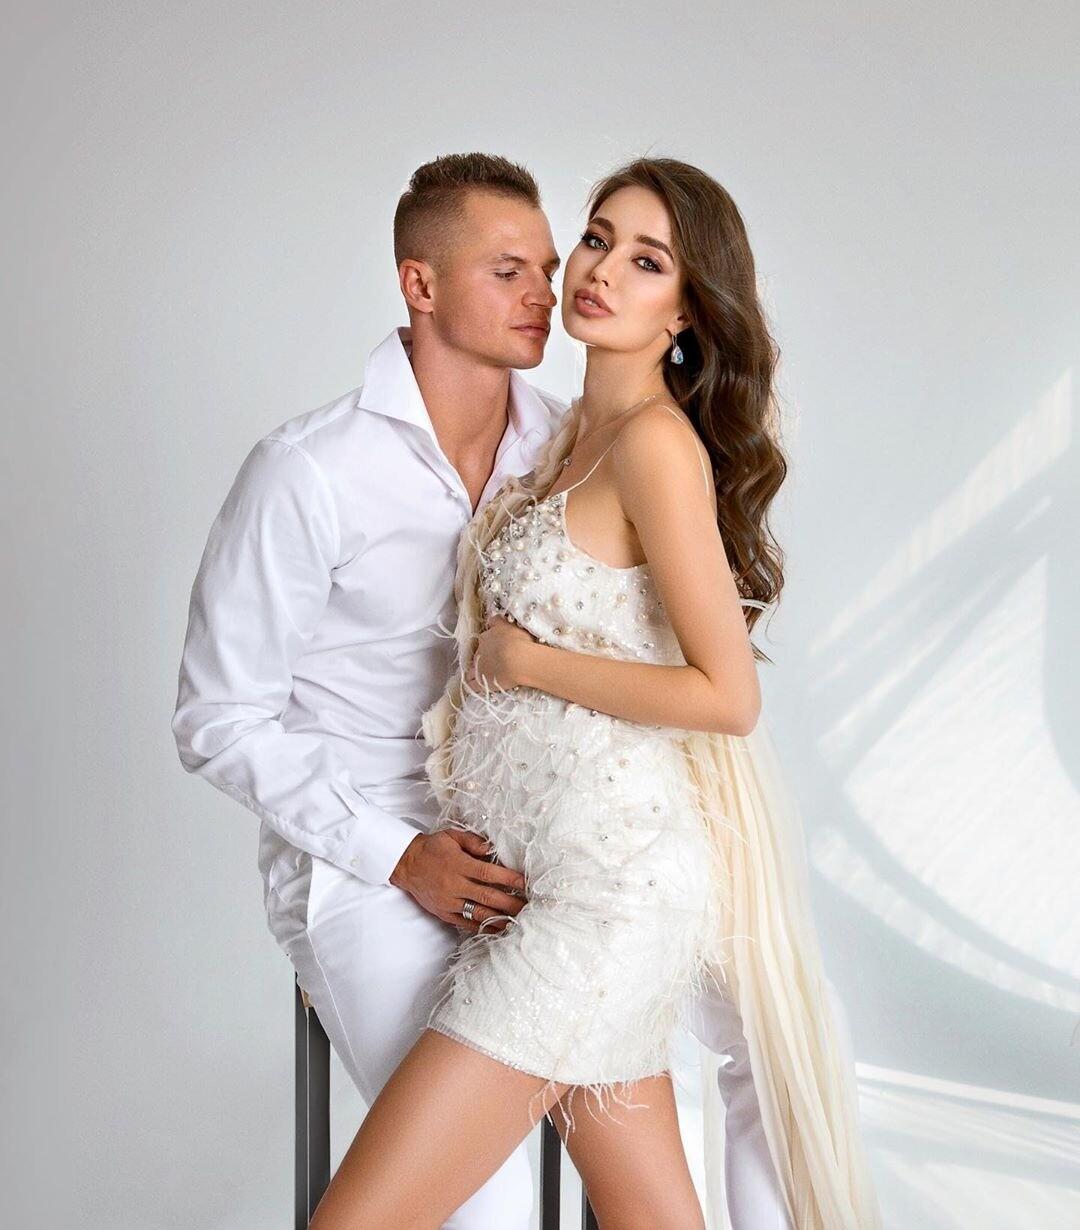 Дмитрий Тарасов выбрал имя для второго ребенка